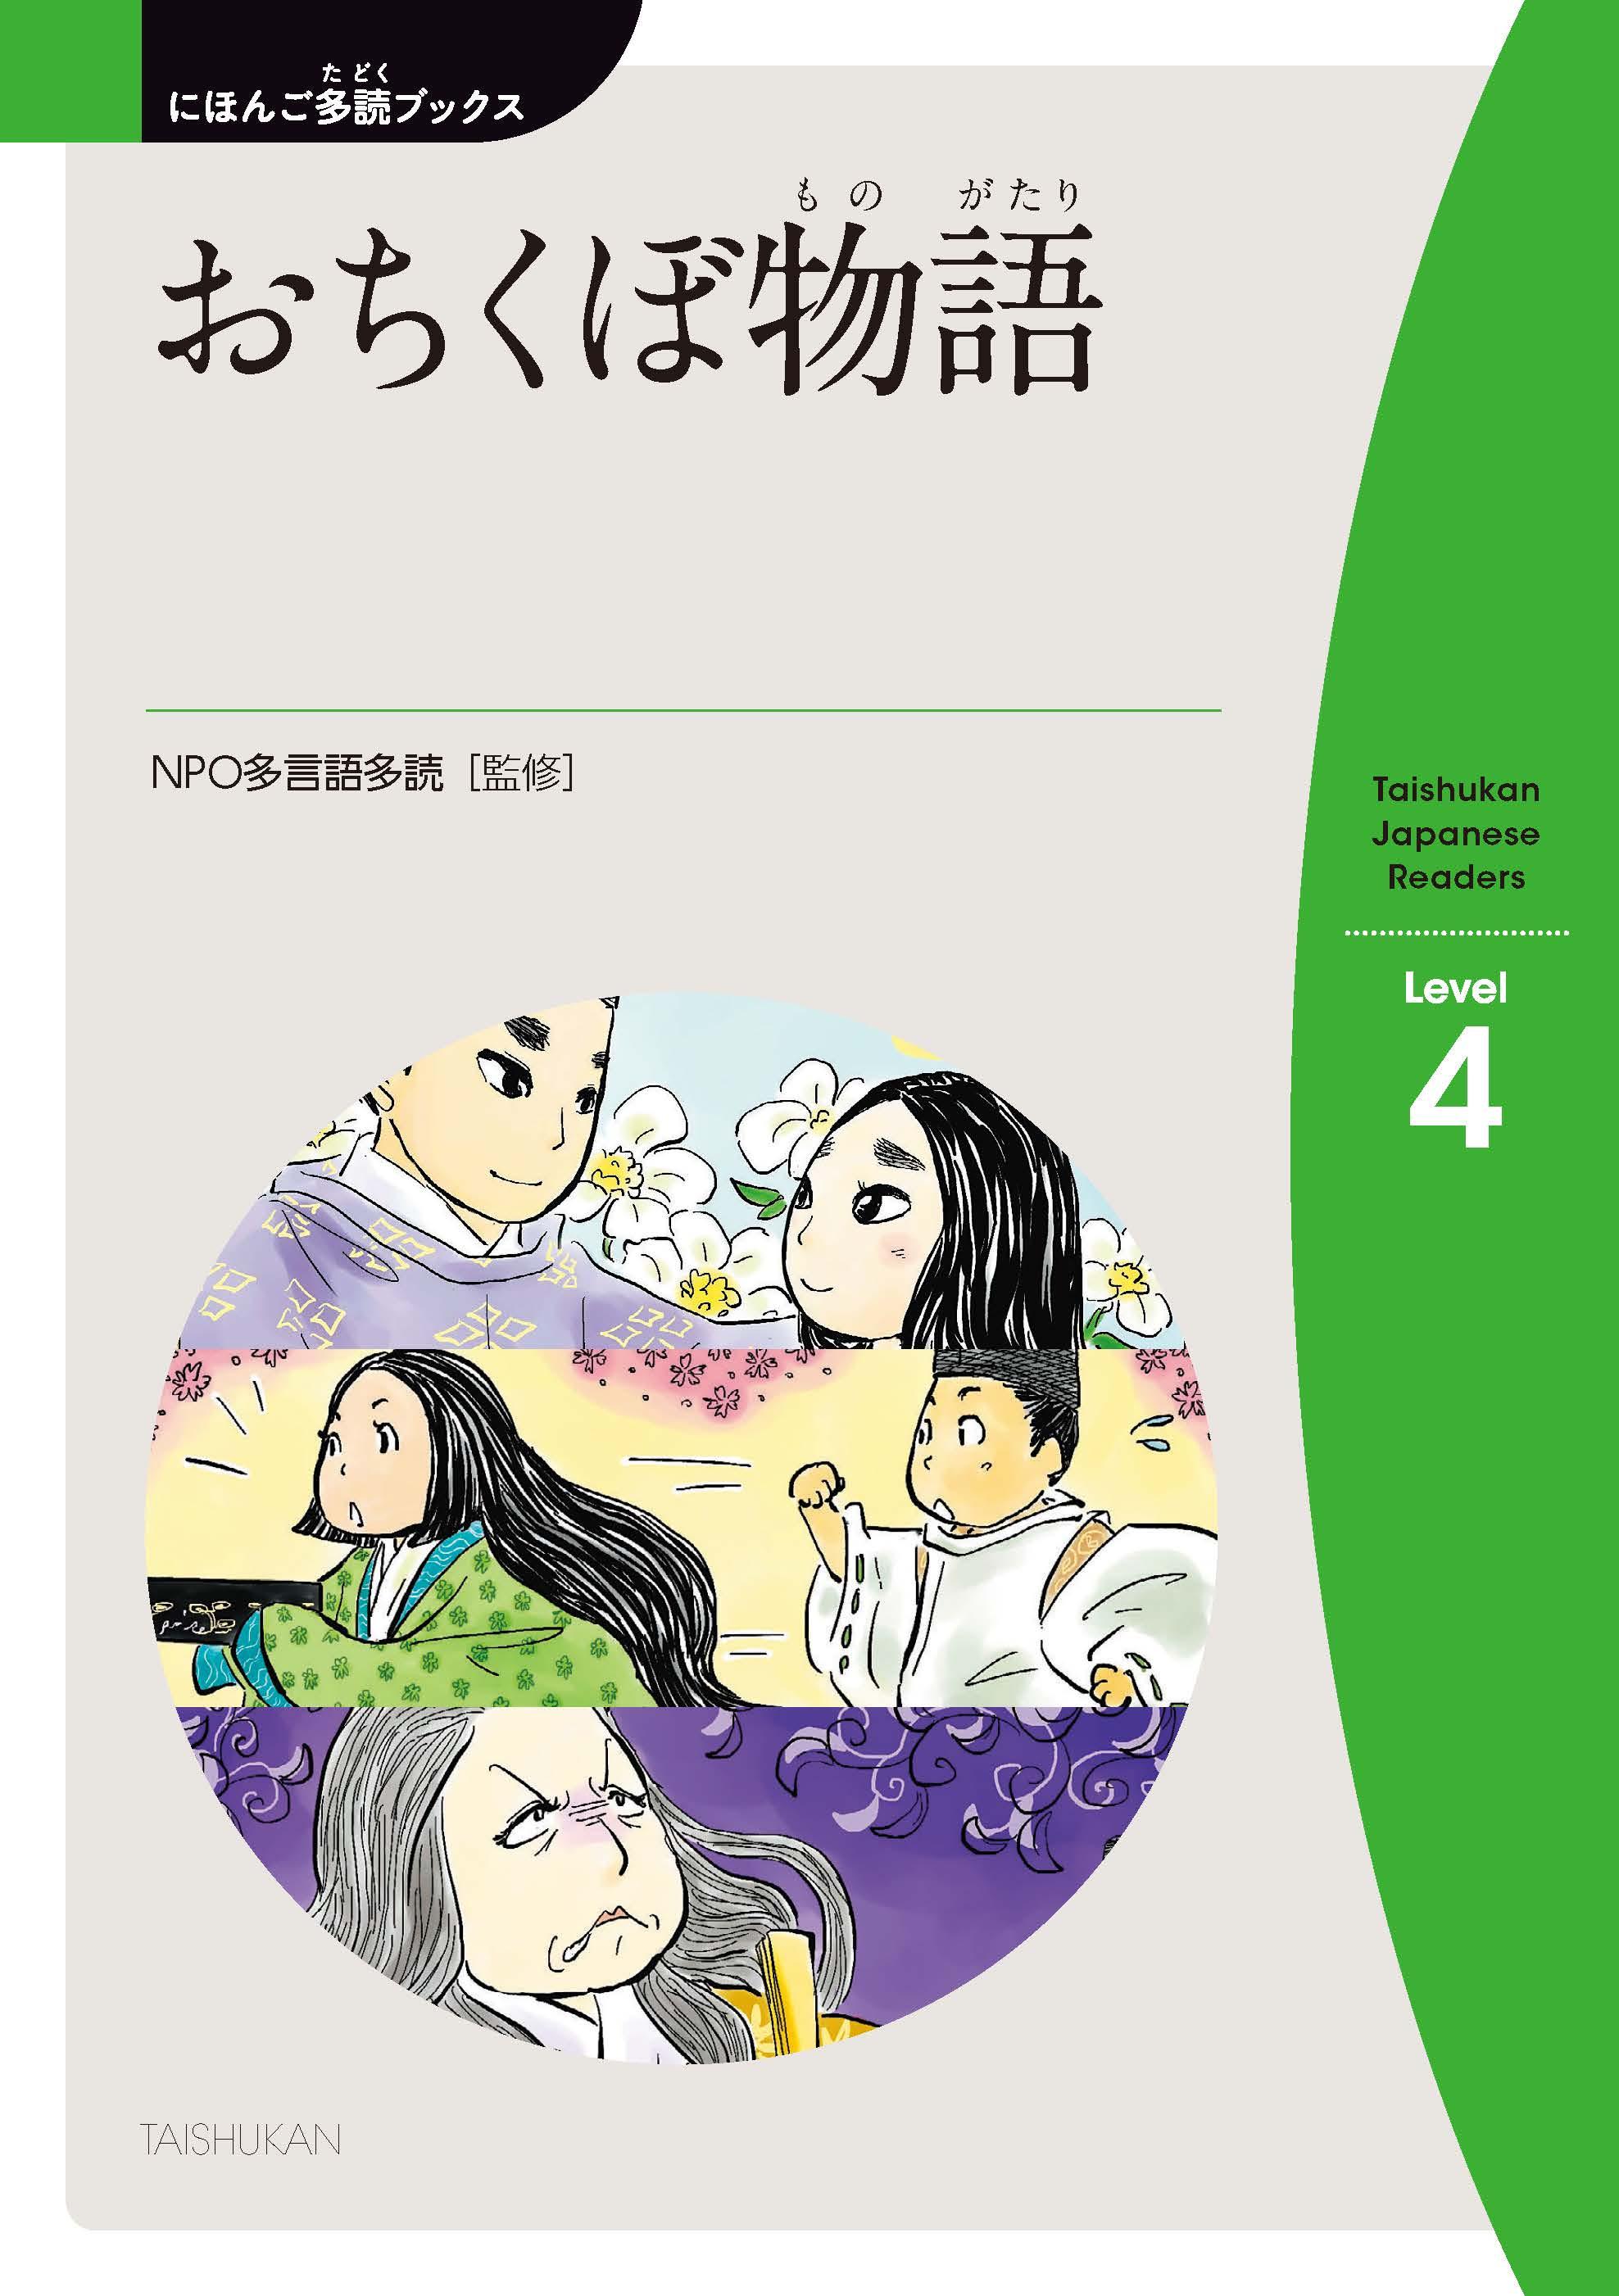 vol.4-5 おちくぼ物語(ものがたり) Tales of Ochikubo